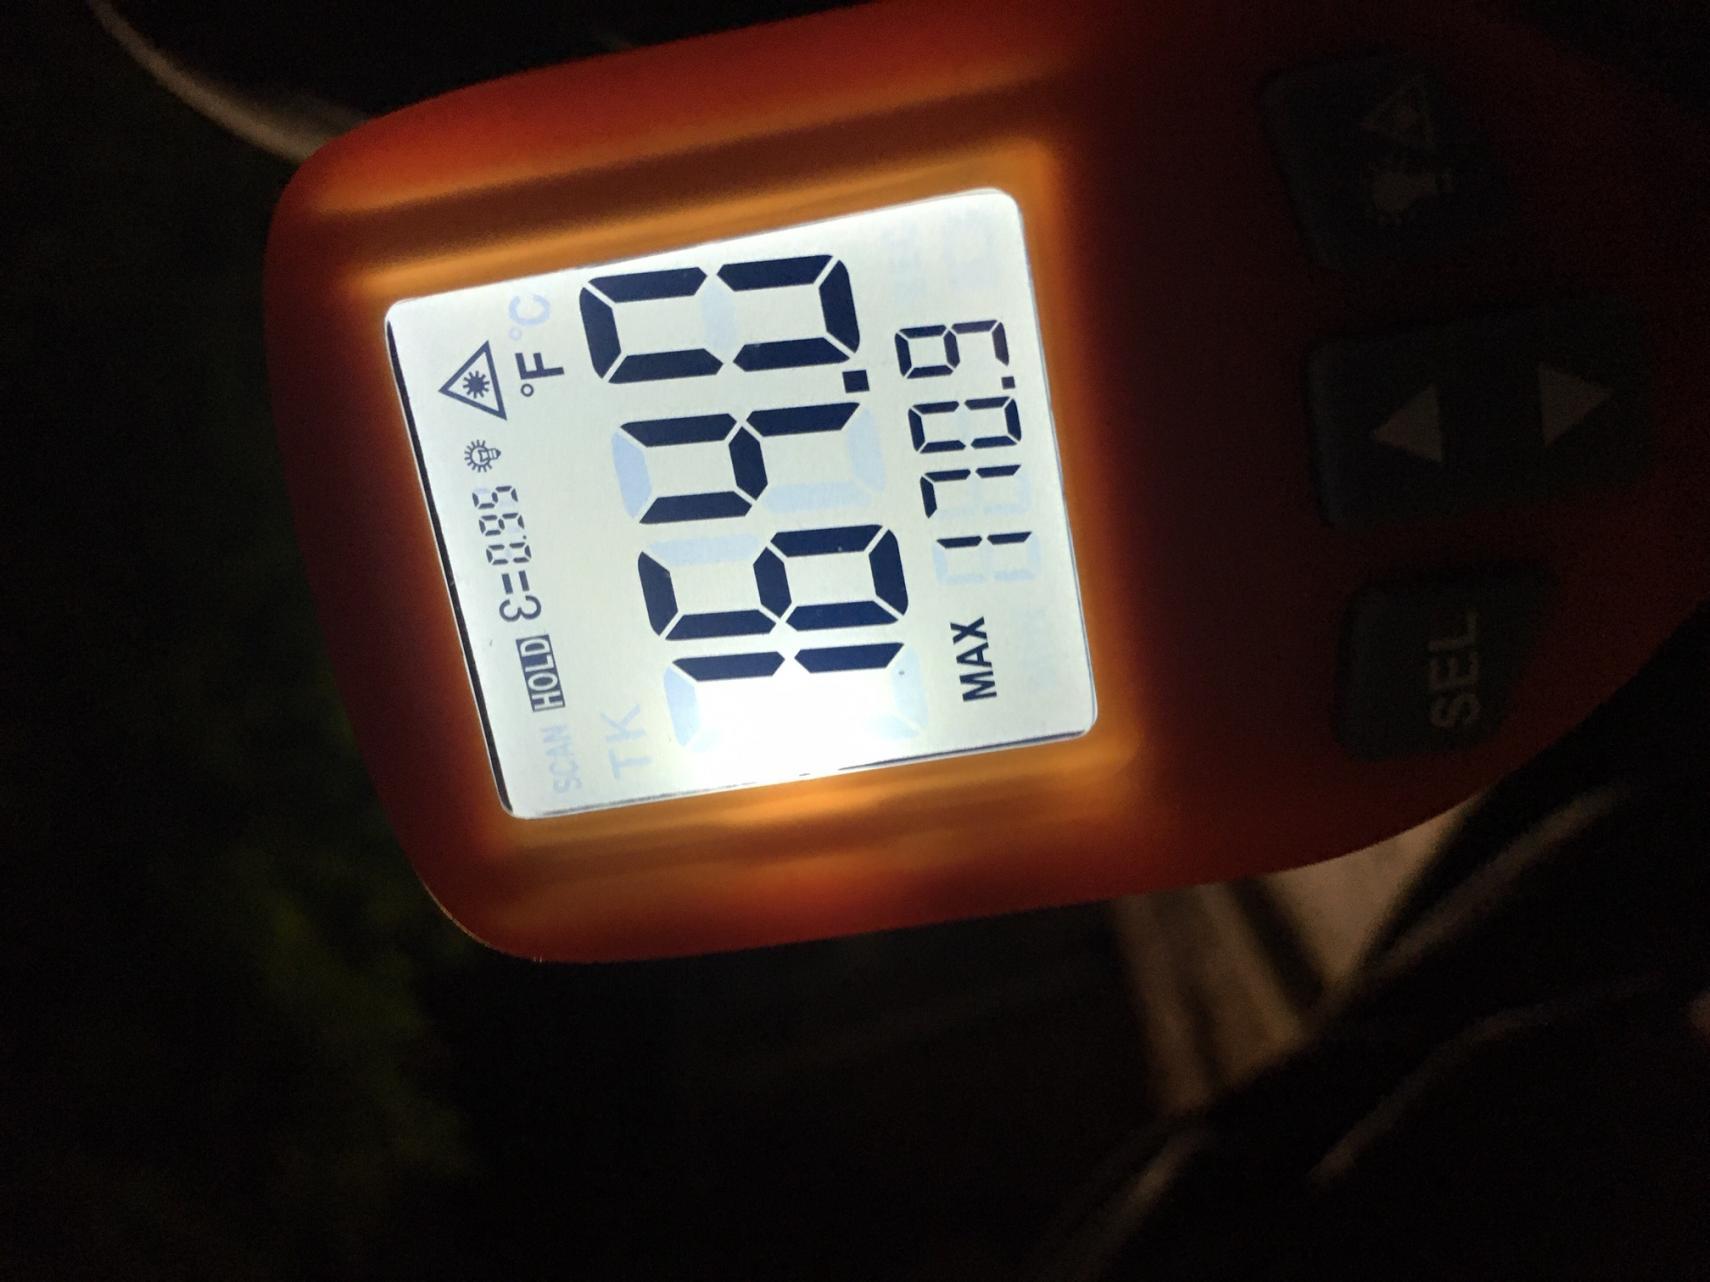 High transmission fluid warning light-979d00da-b5d5-4589-aa56-f65e07f0798e-jpg